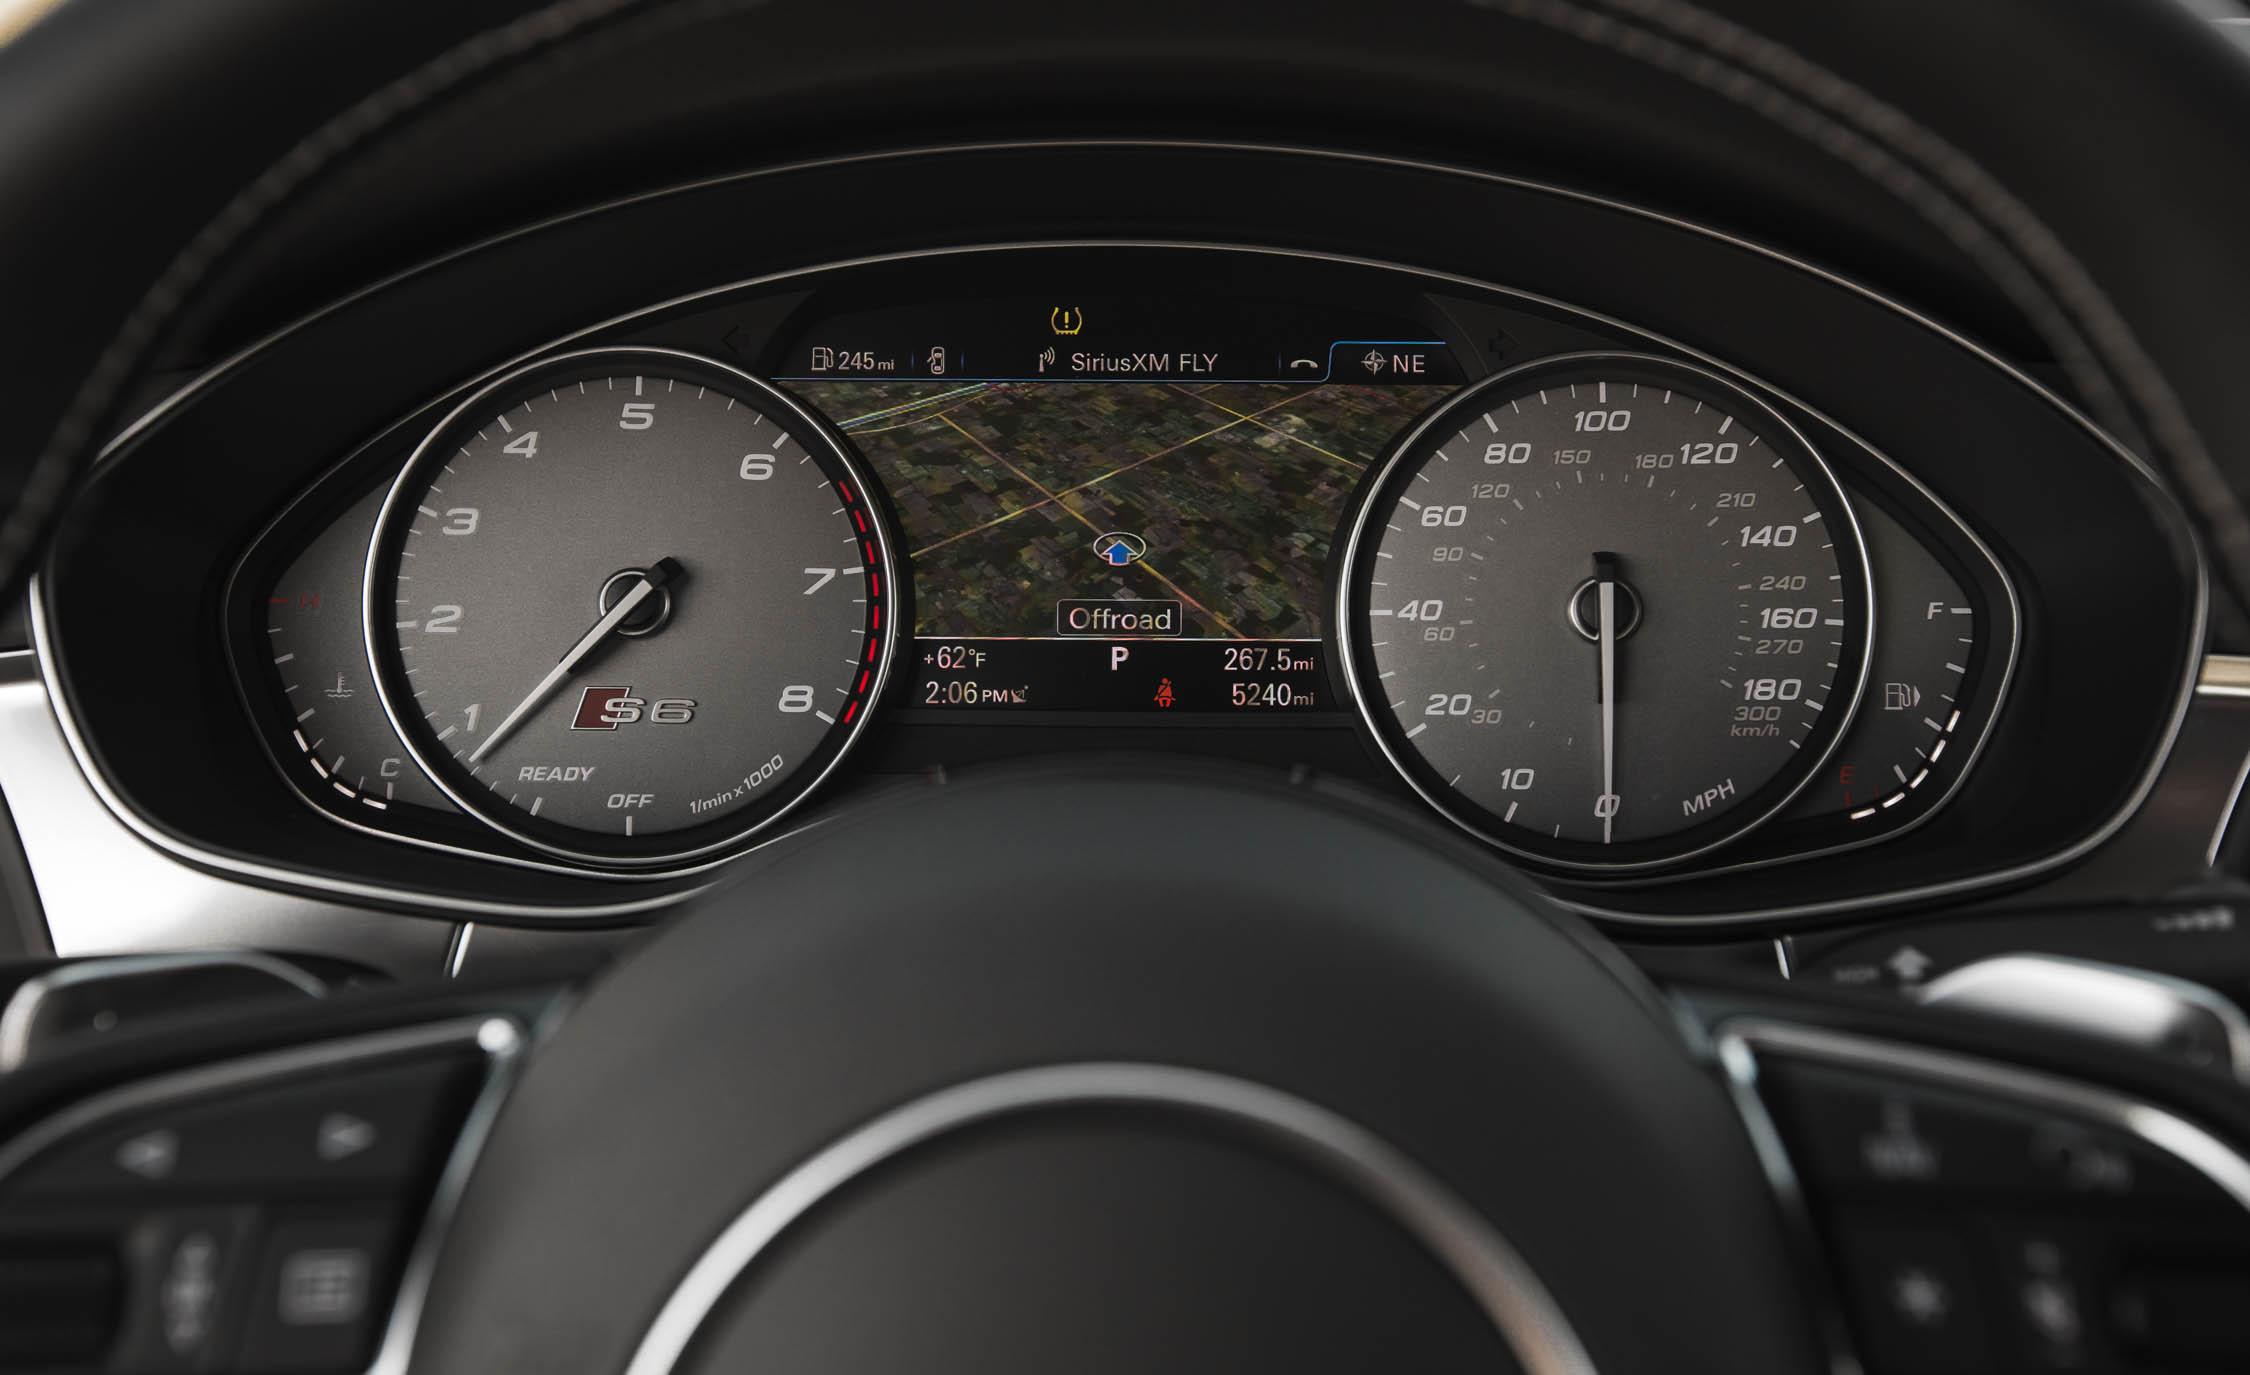 2016 Audi S6 Interior Speedometer